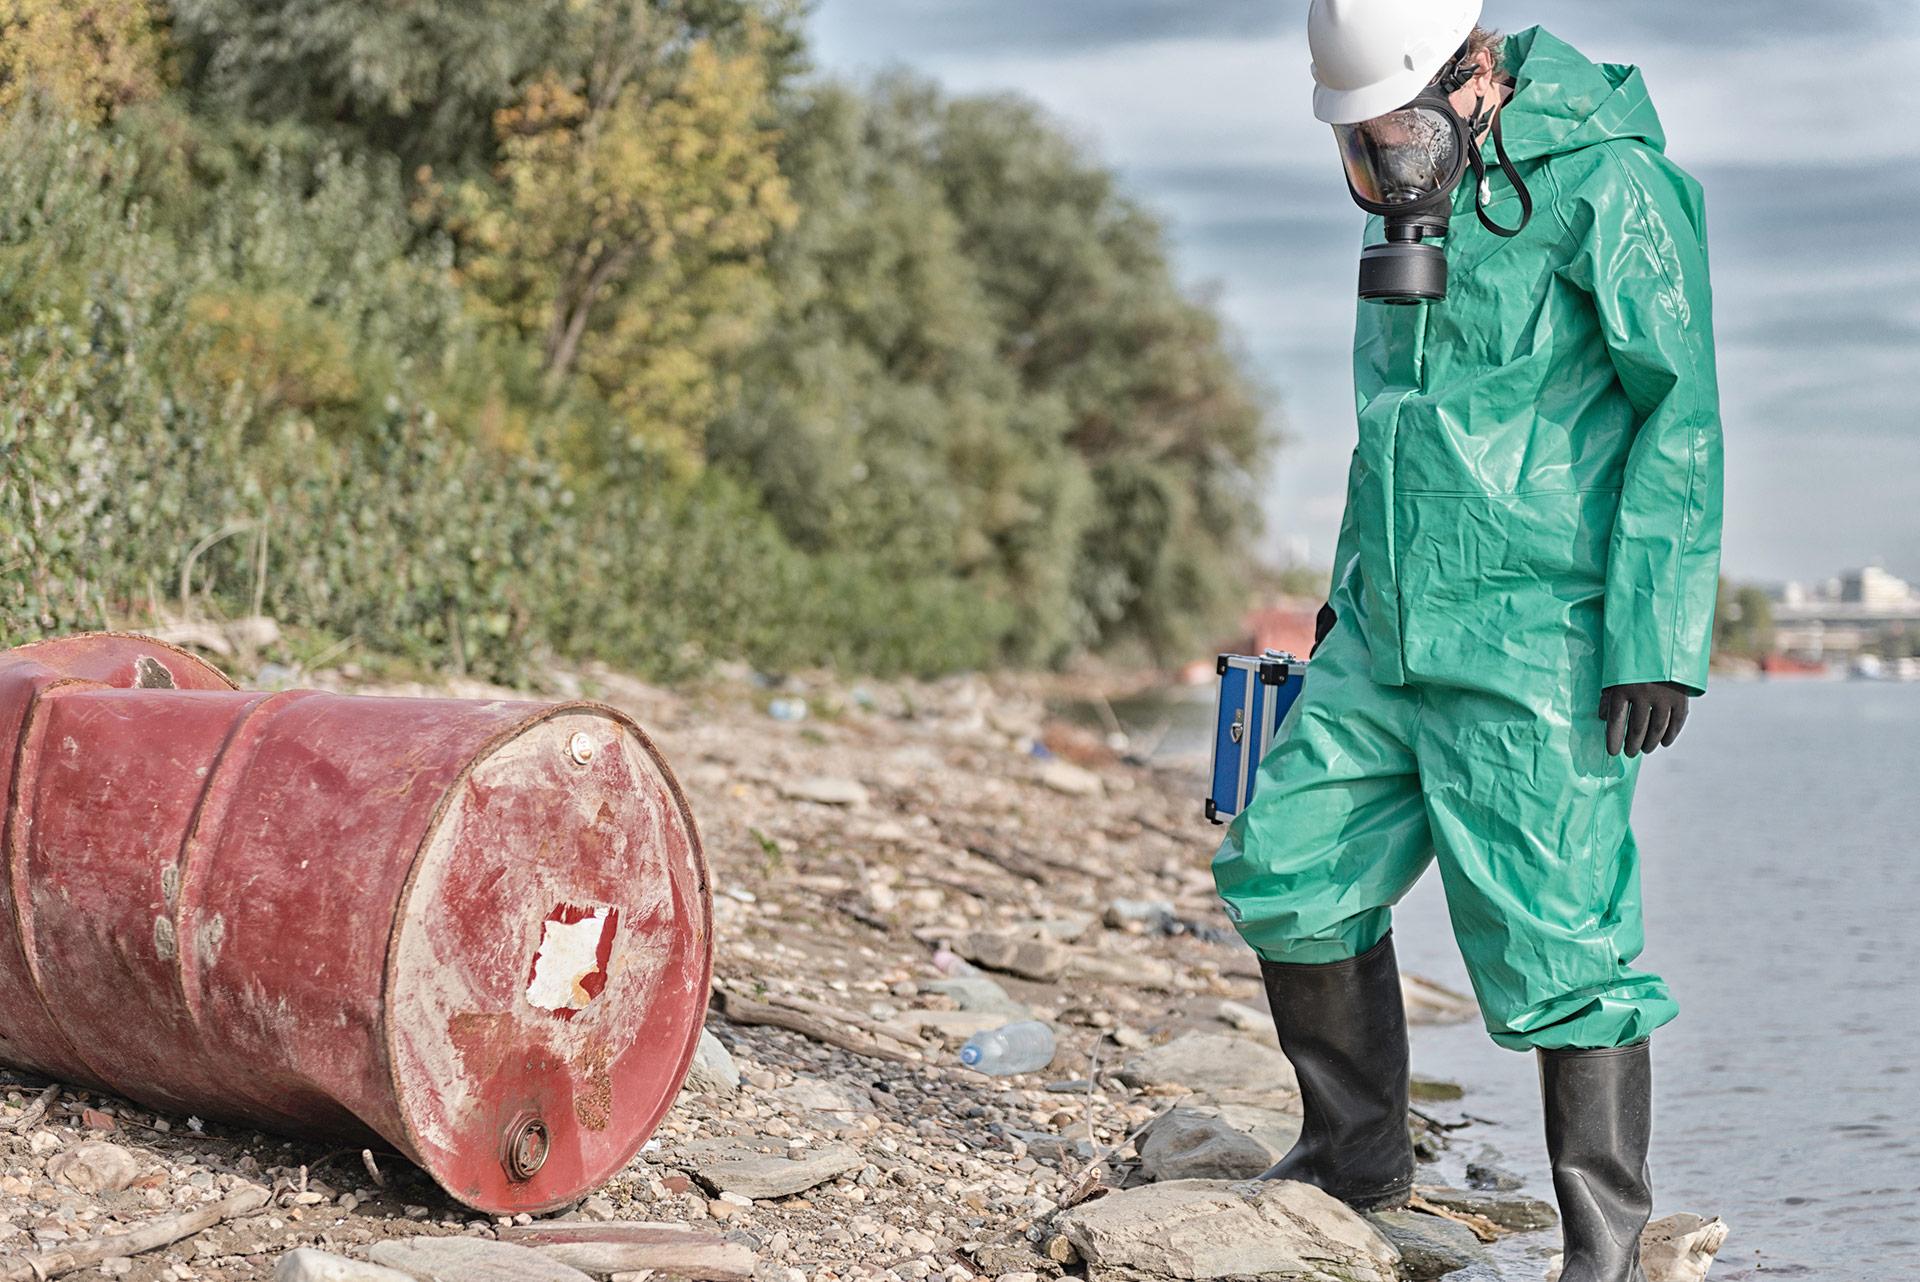 Water pollution in Lebanon reaching dangerous levels